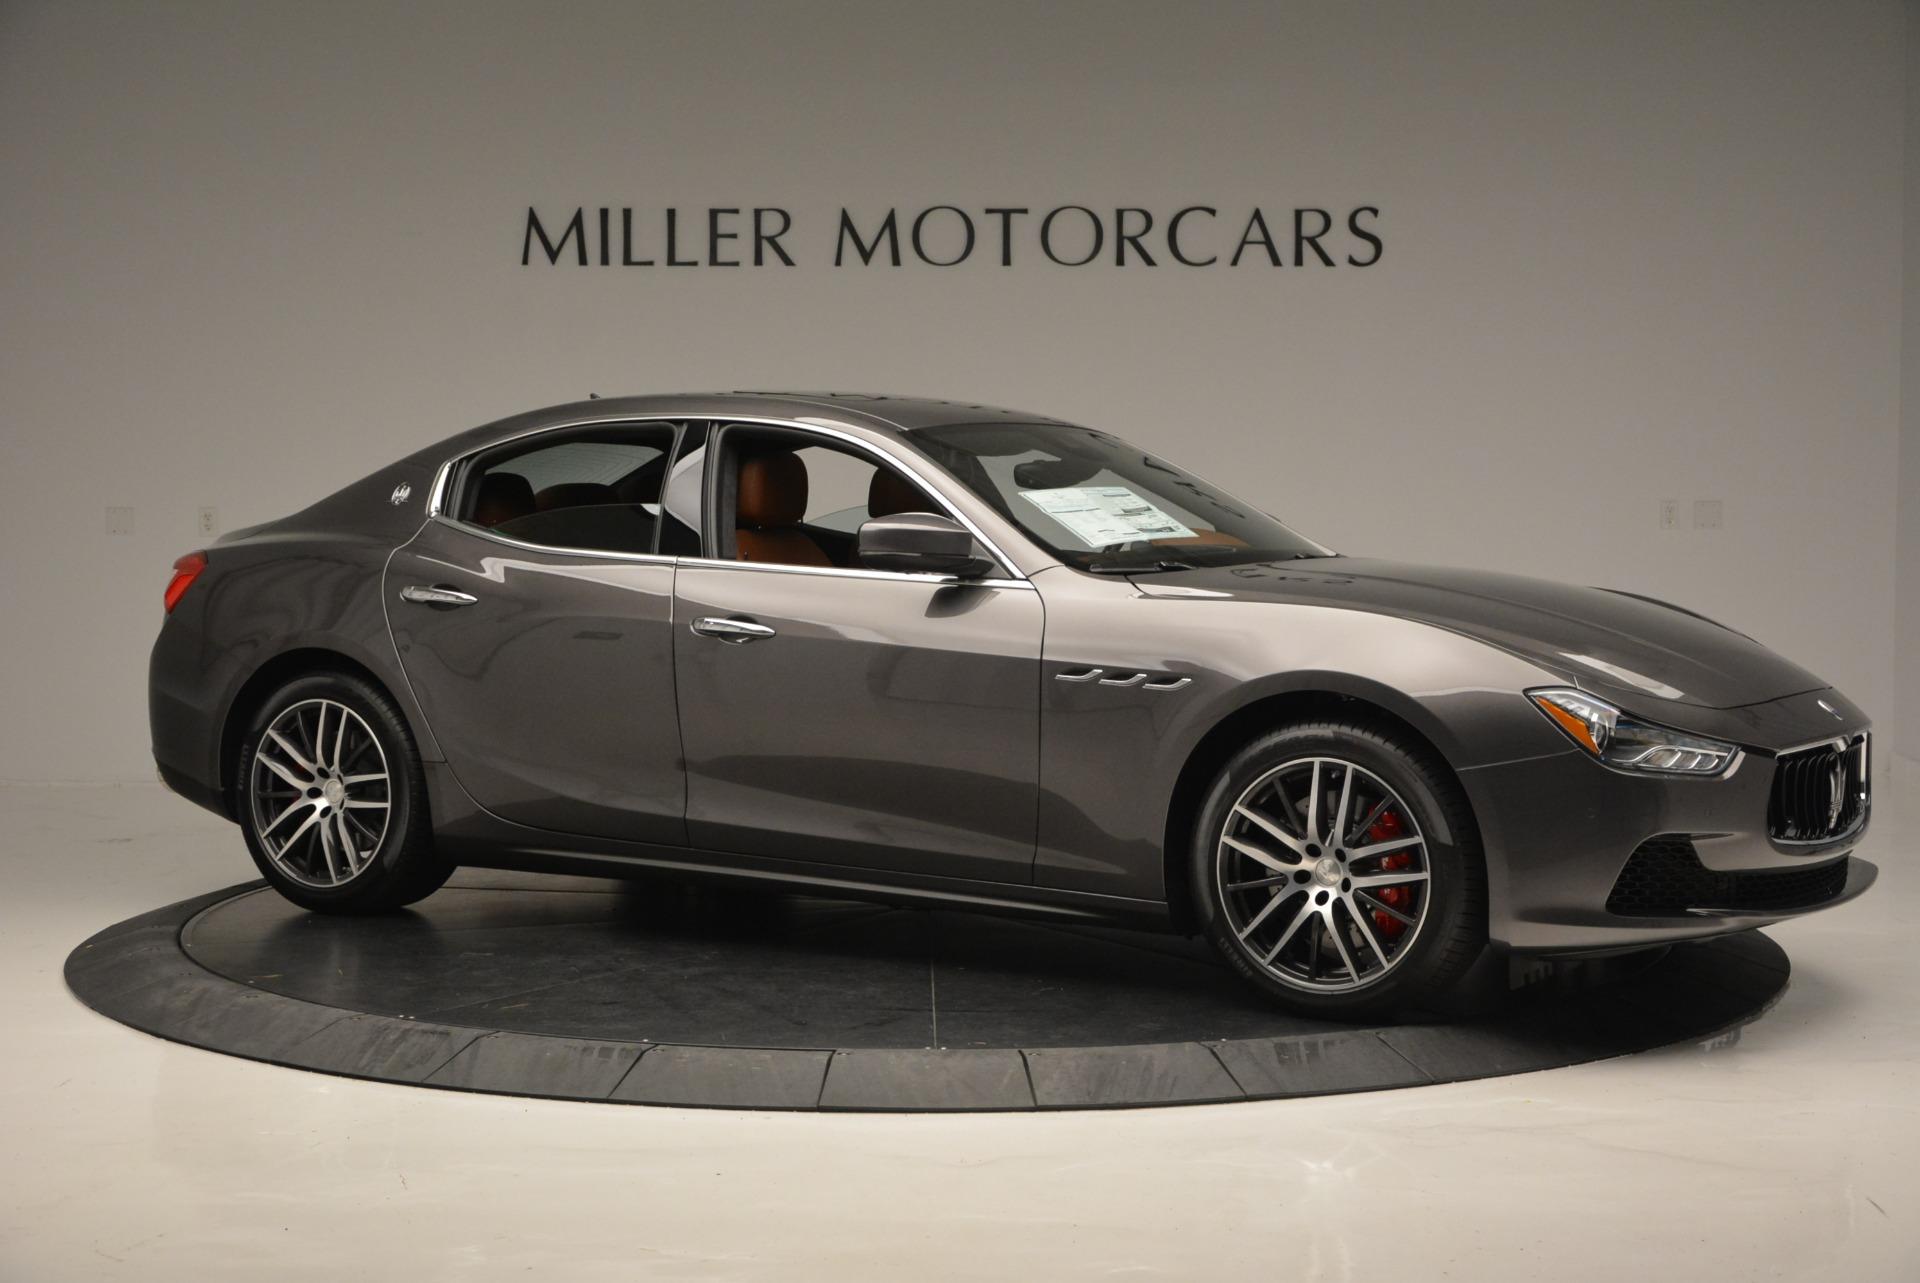 Used 2018 Maserati Ghibli S Q4 For Sale In Greenwich, CT 1566_p10